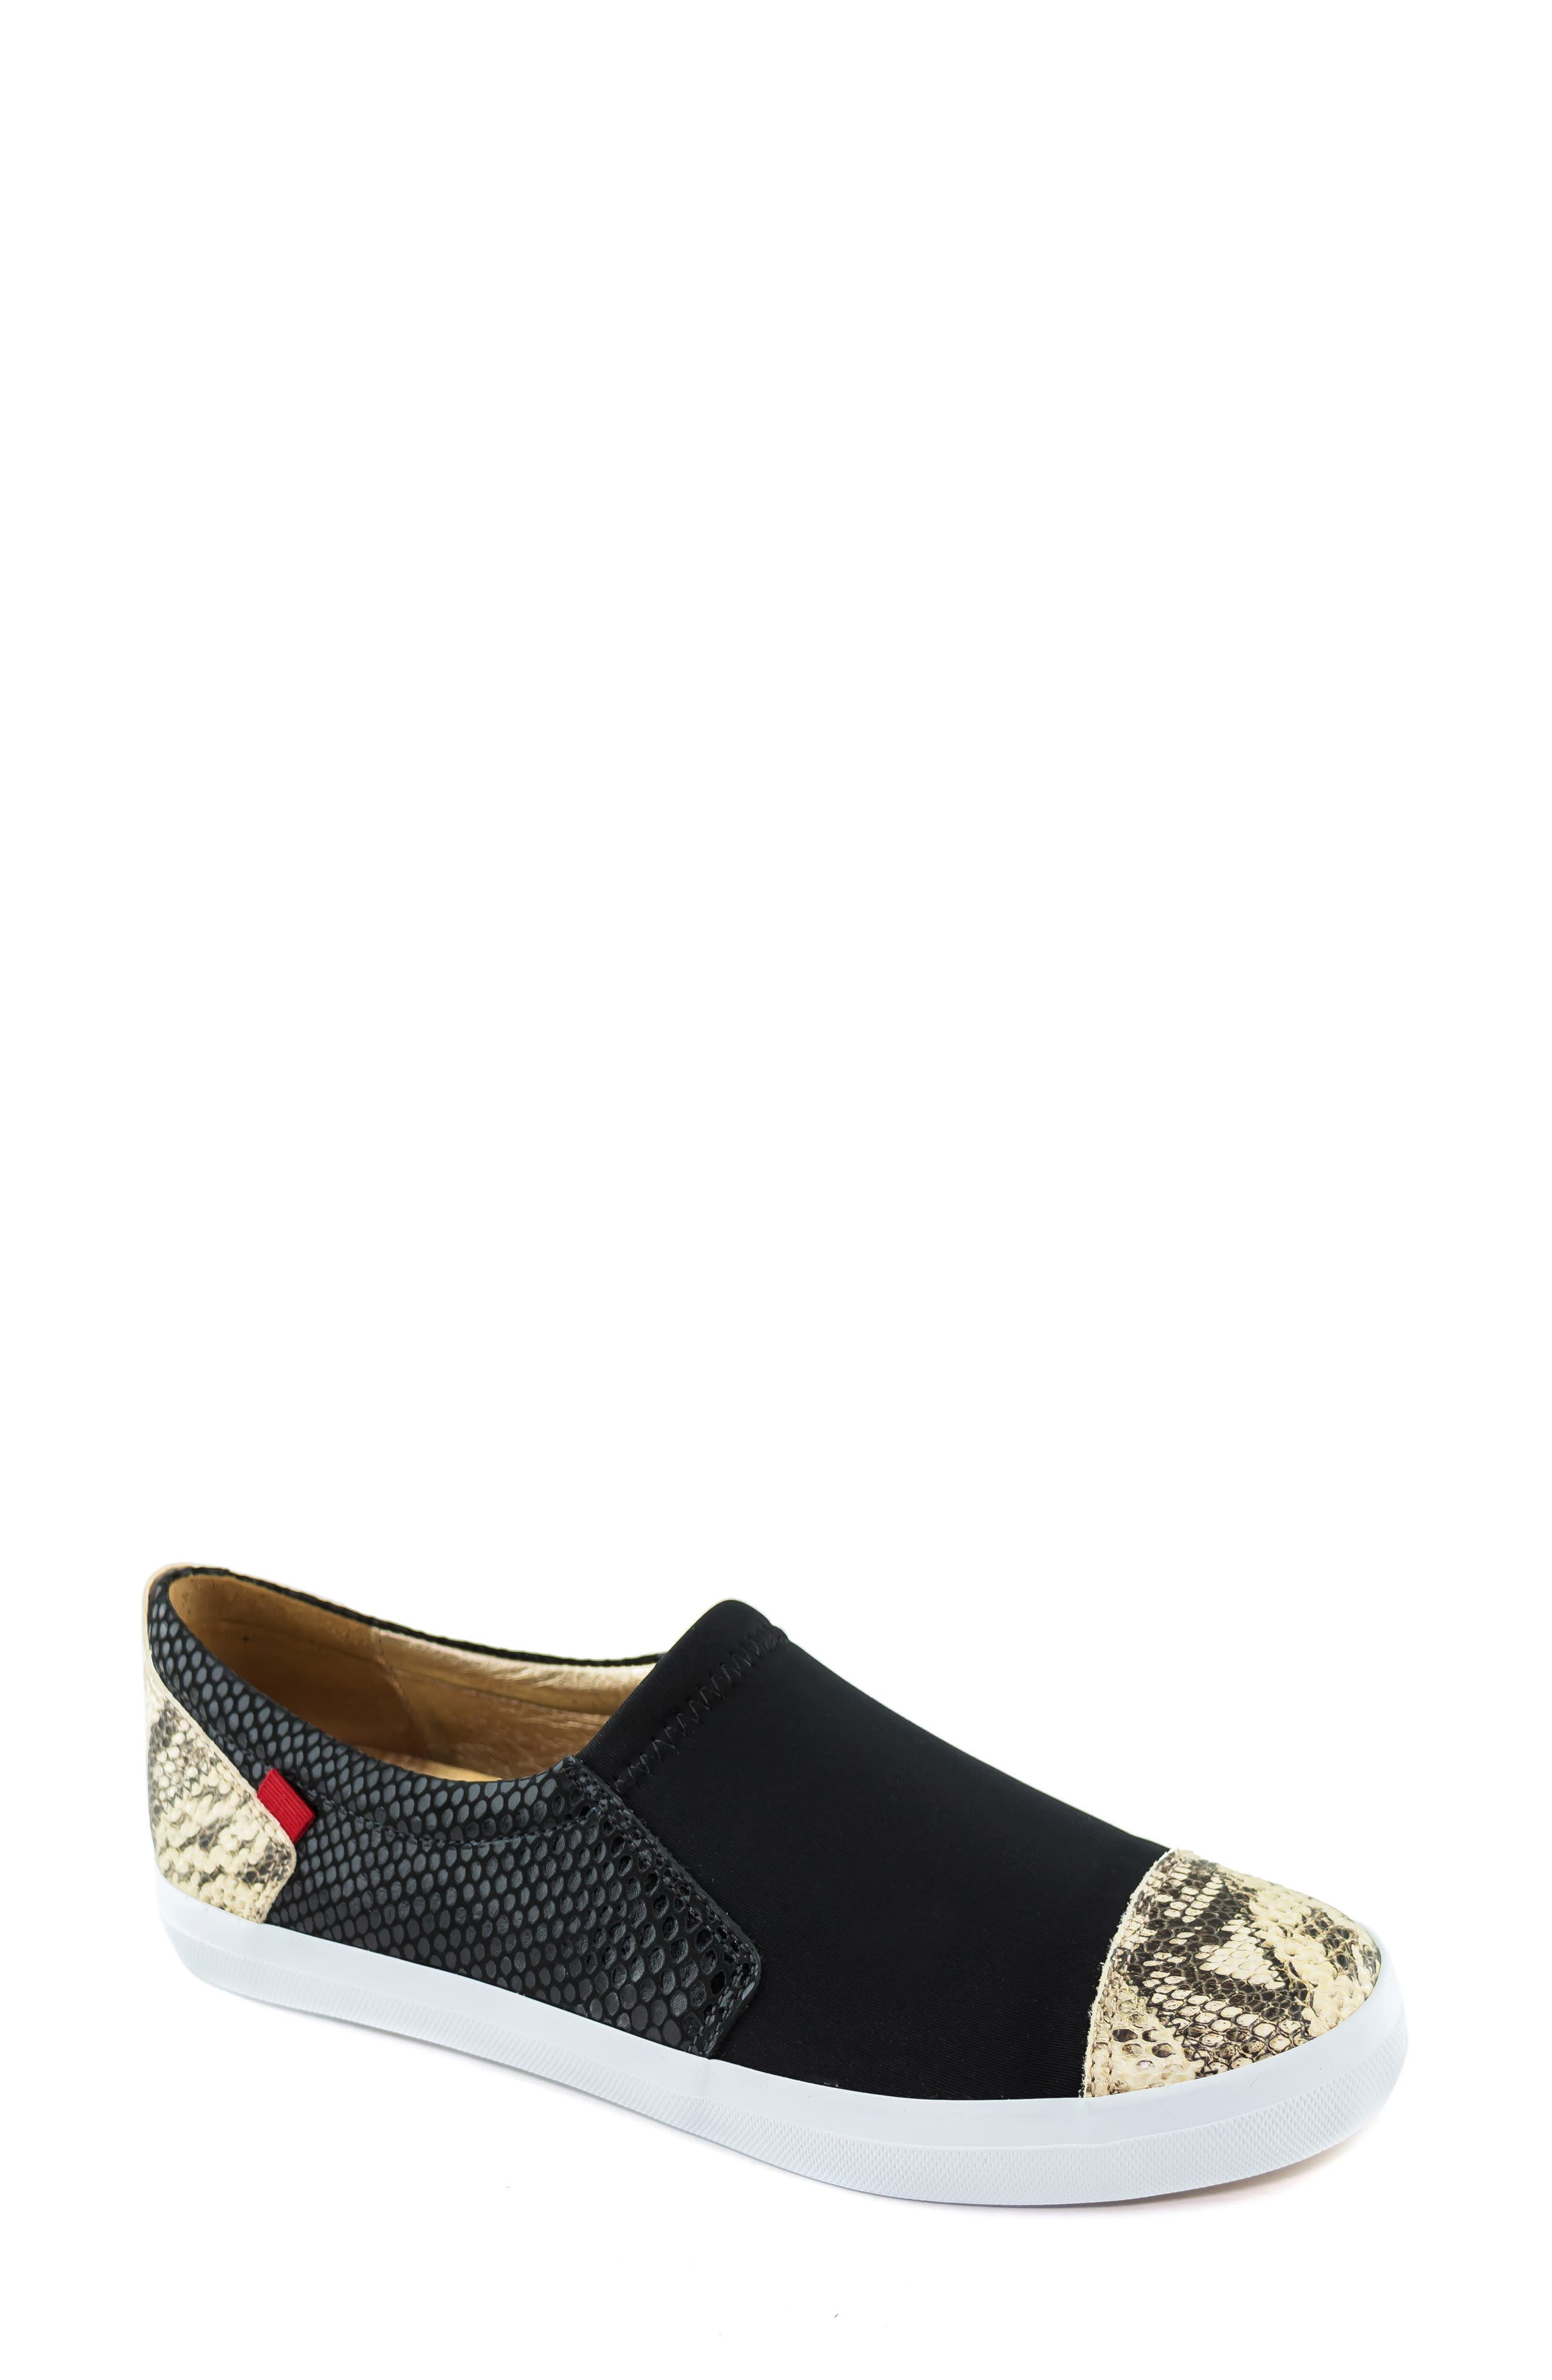 MARC JOSEPH NEW YORK, Jay Street Sneaker, Main thumbnail 1, color, BLACK PATCHWORK